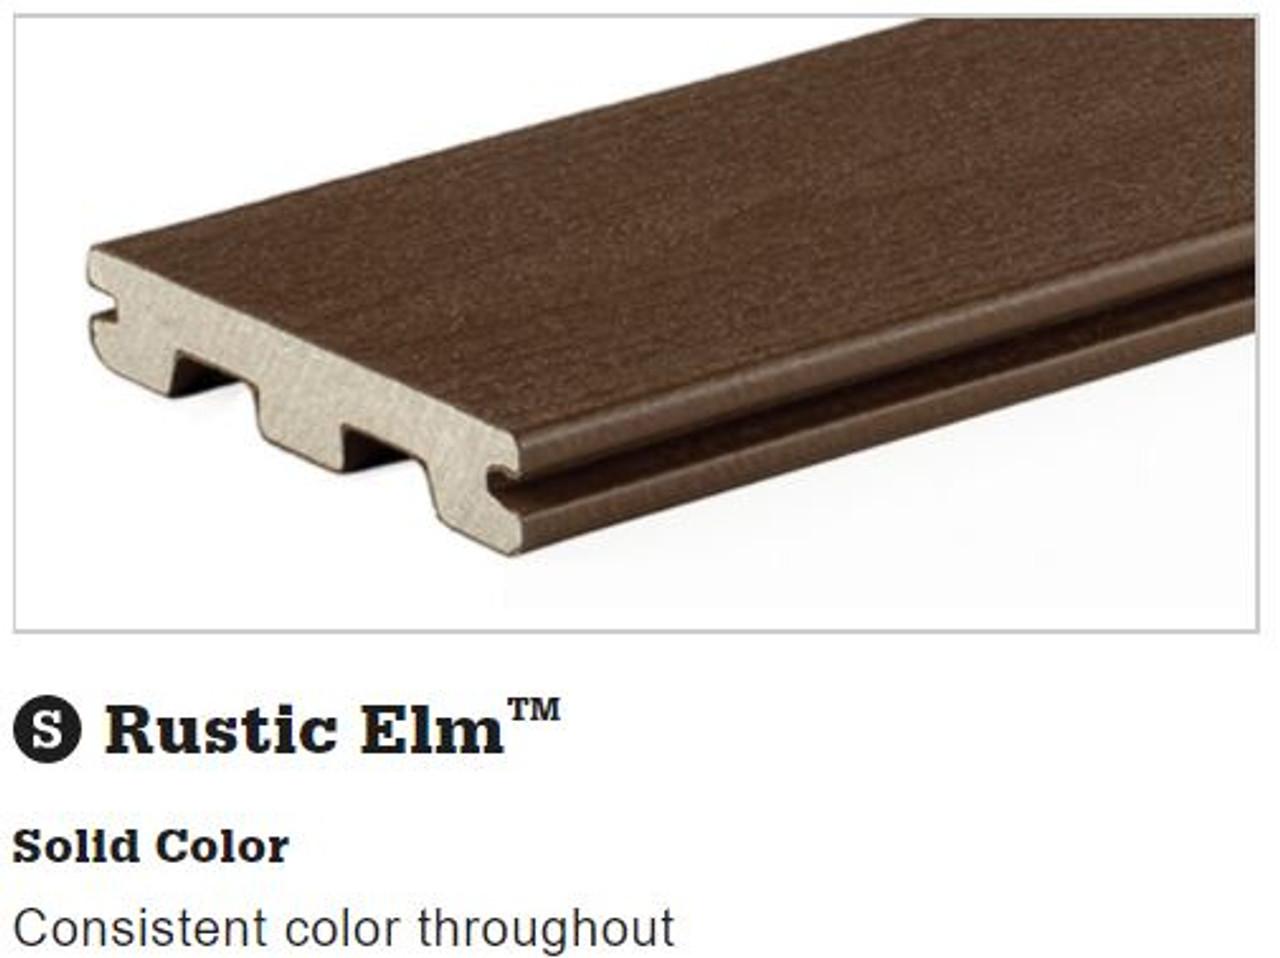 TimberTech Terrain Rustic Elm Grooved Decking